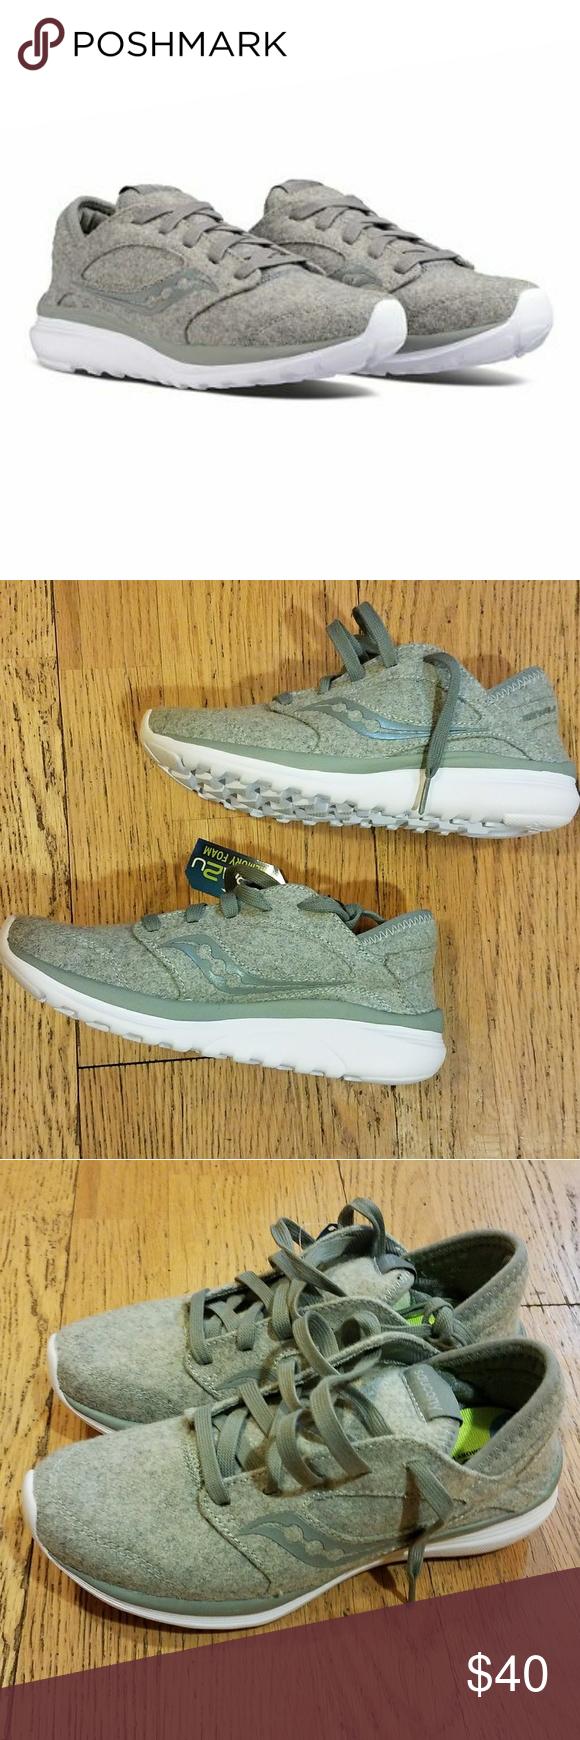 SOLD! Saucony Kineta Relay Wool Sneaker